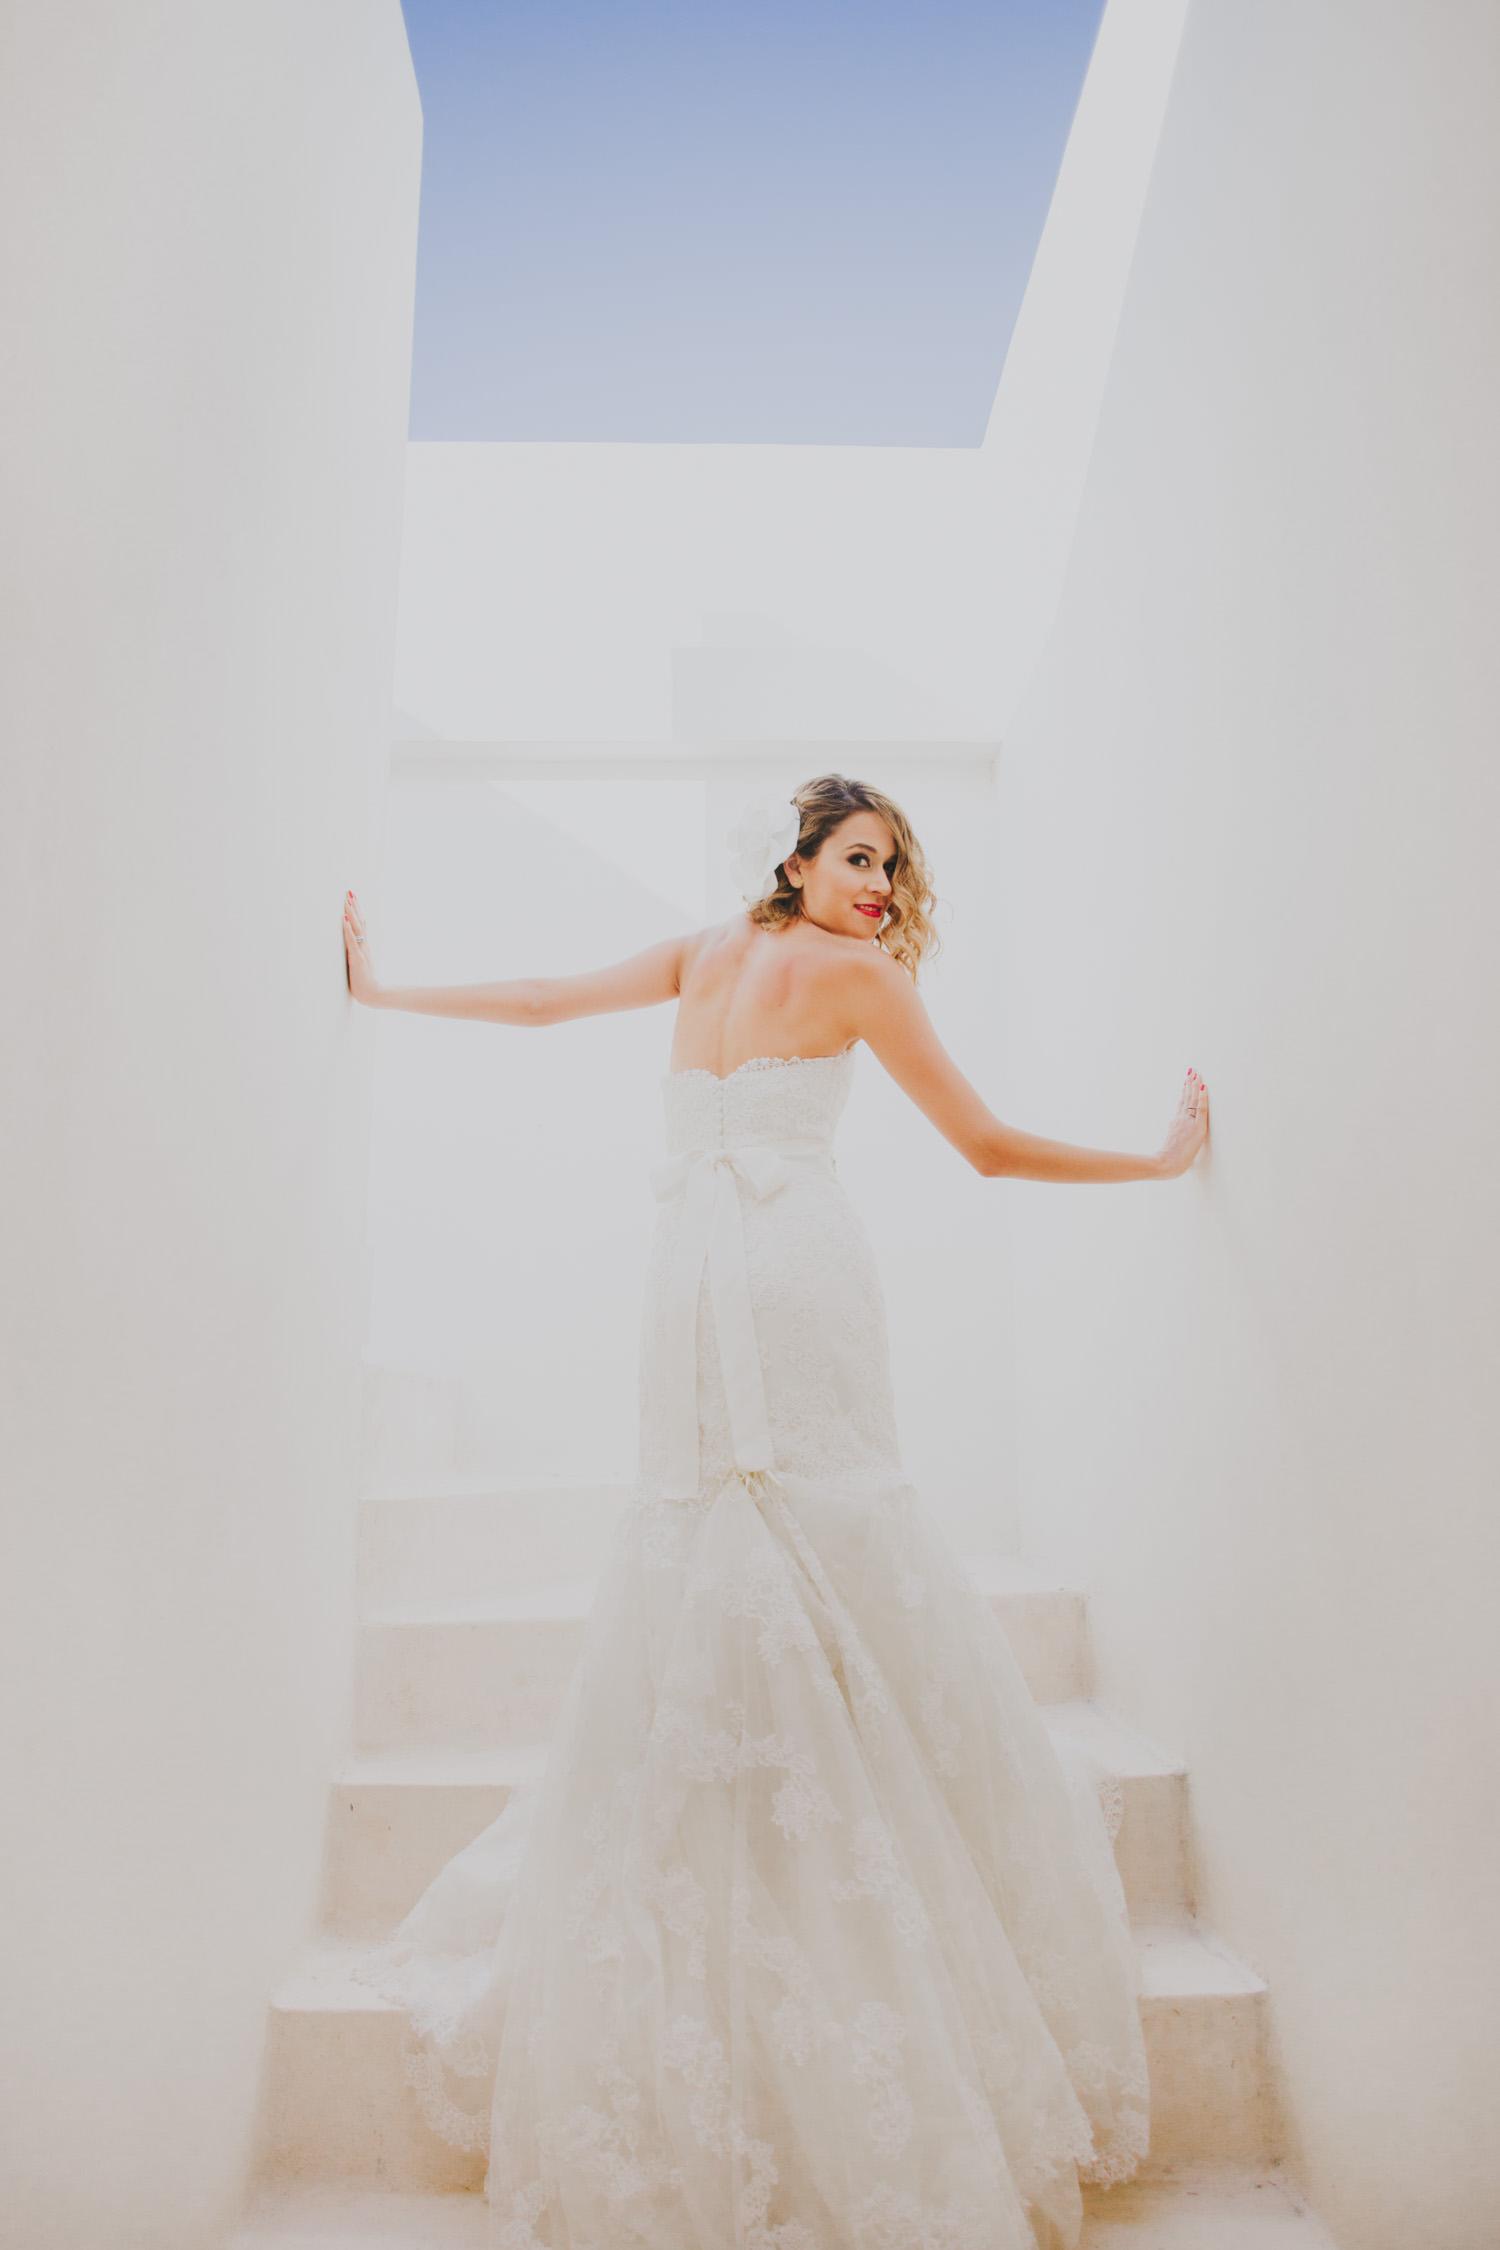 Tulum-Wedding-Photography-Bride-Pierce--15.jpg